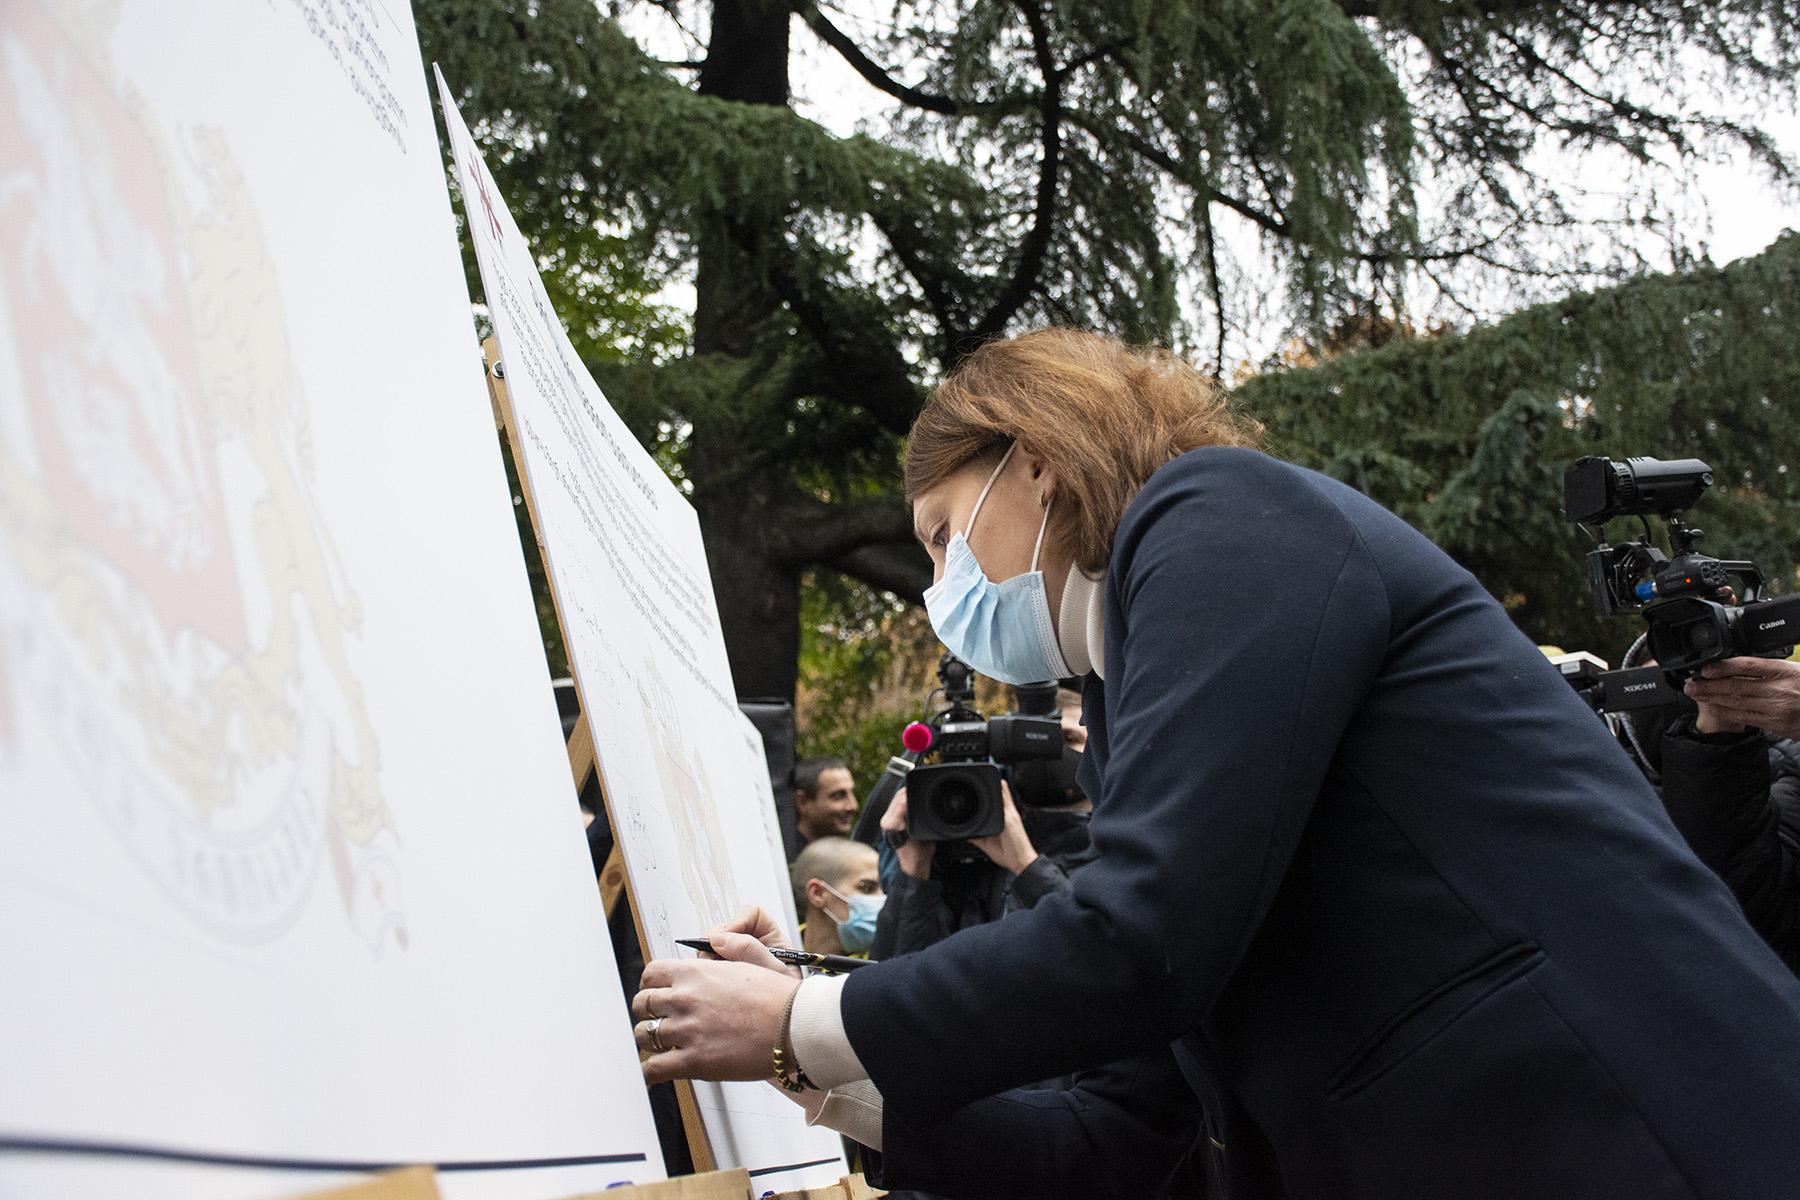 Elene Khoshtaria from the European Georgia signs the memorandum. Photo: Mariam Nikuradze/OC Media.